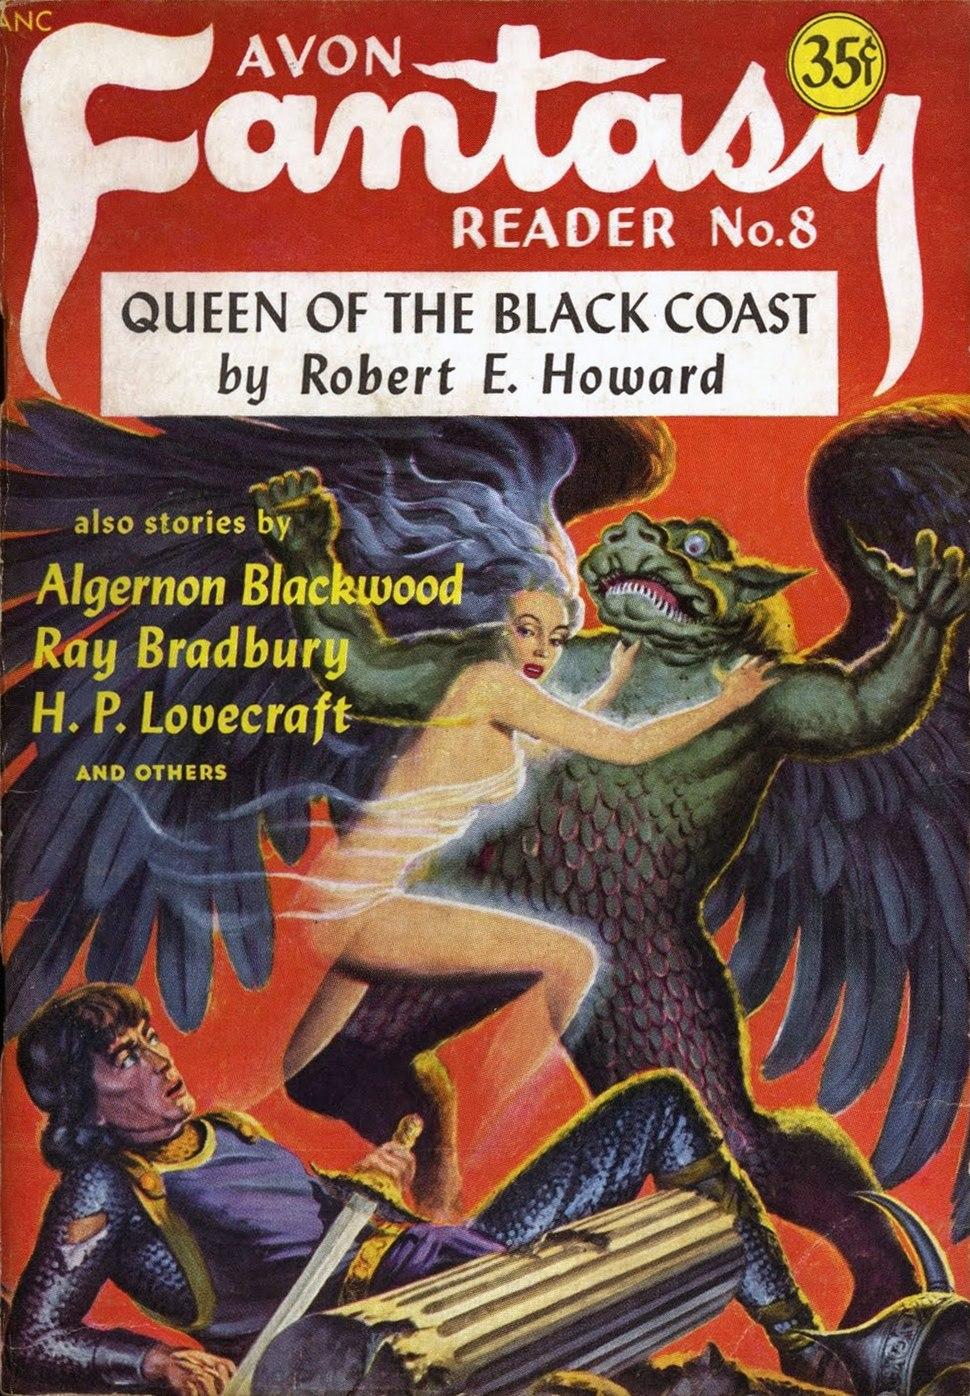 Avon Fantasy Reader (1948-11-23) cover